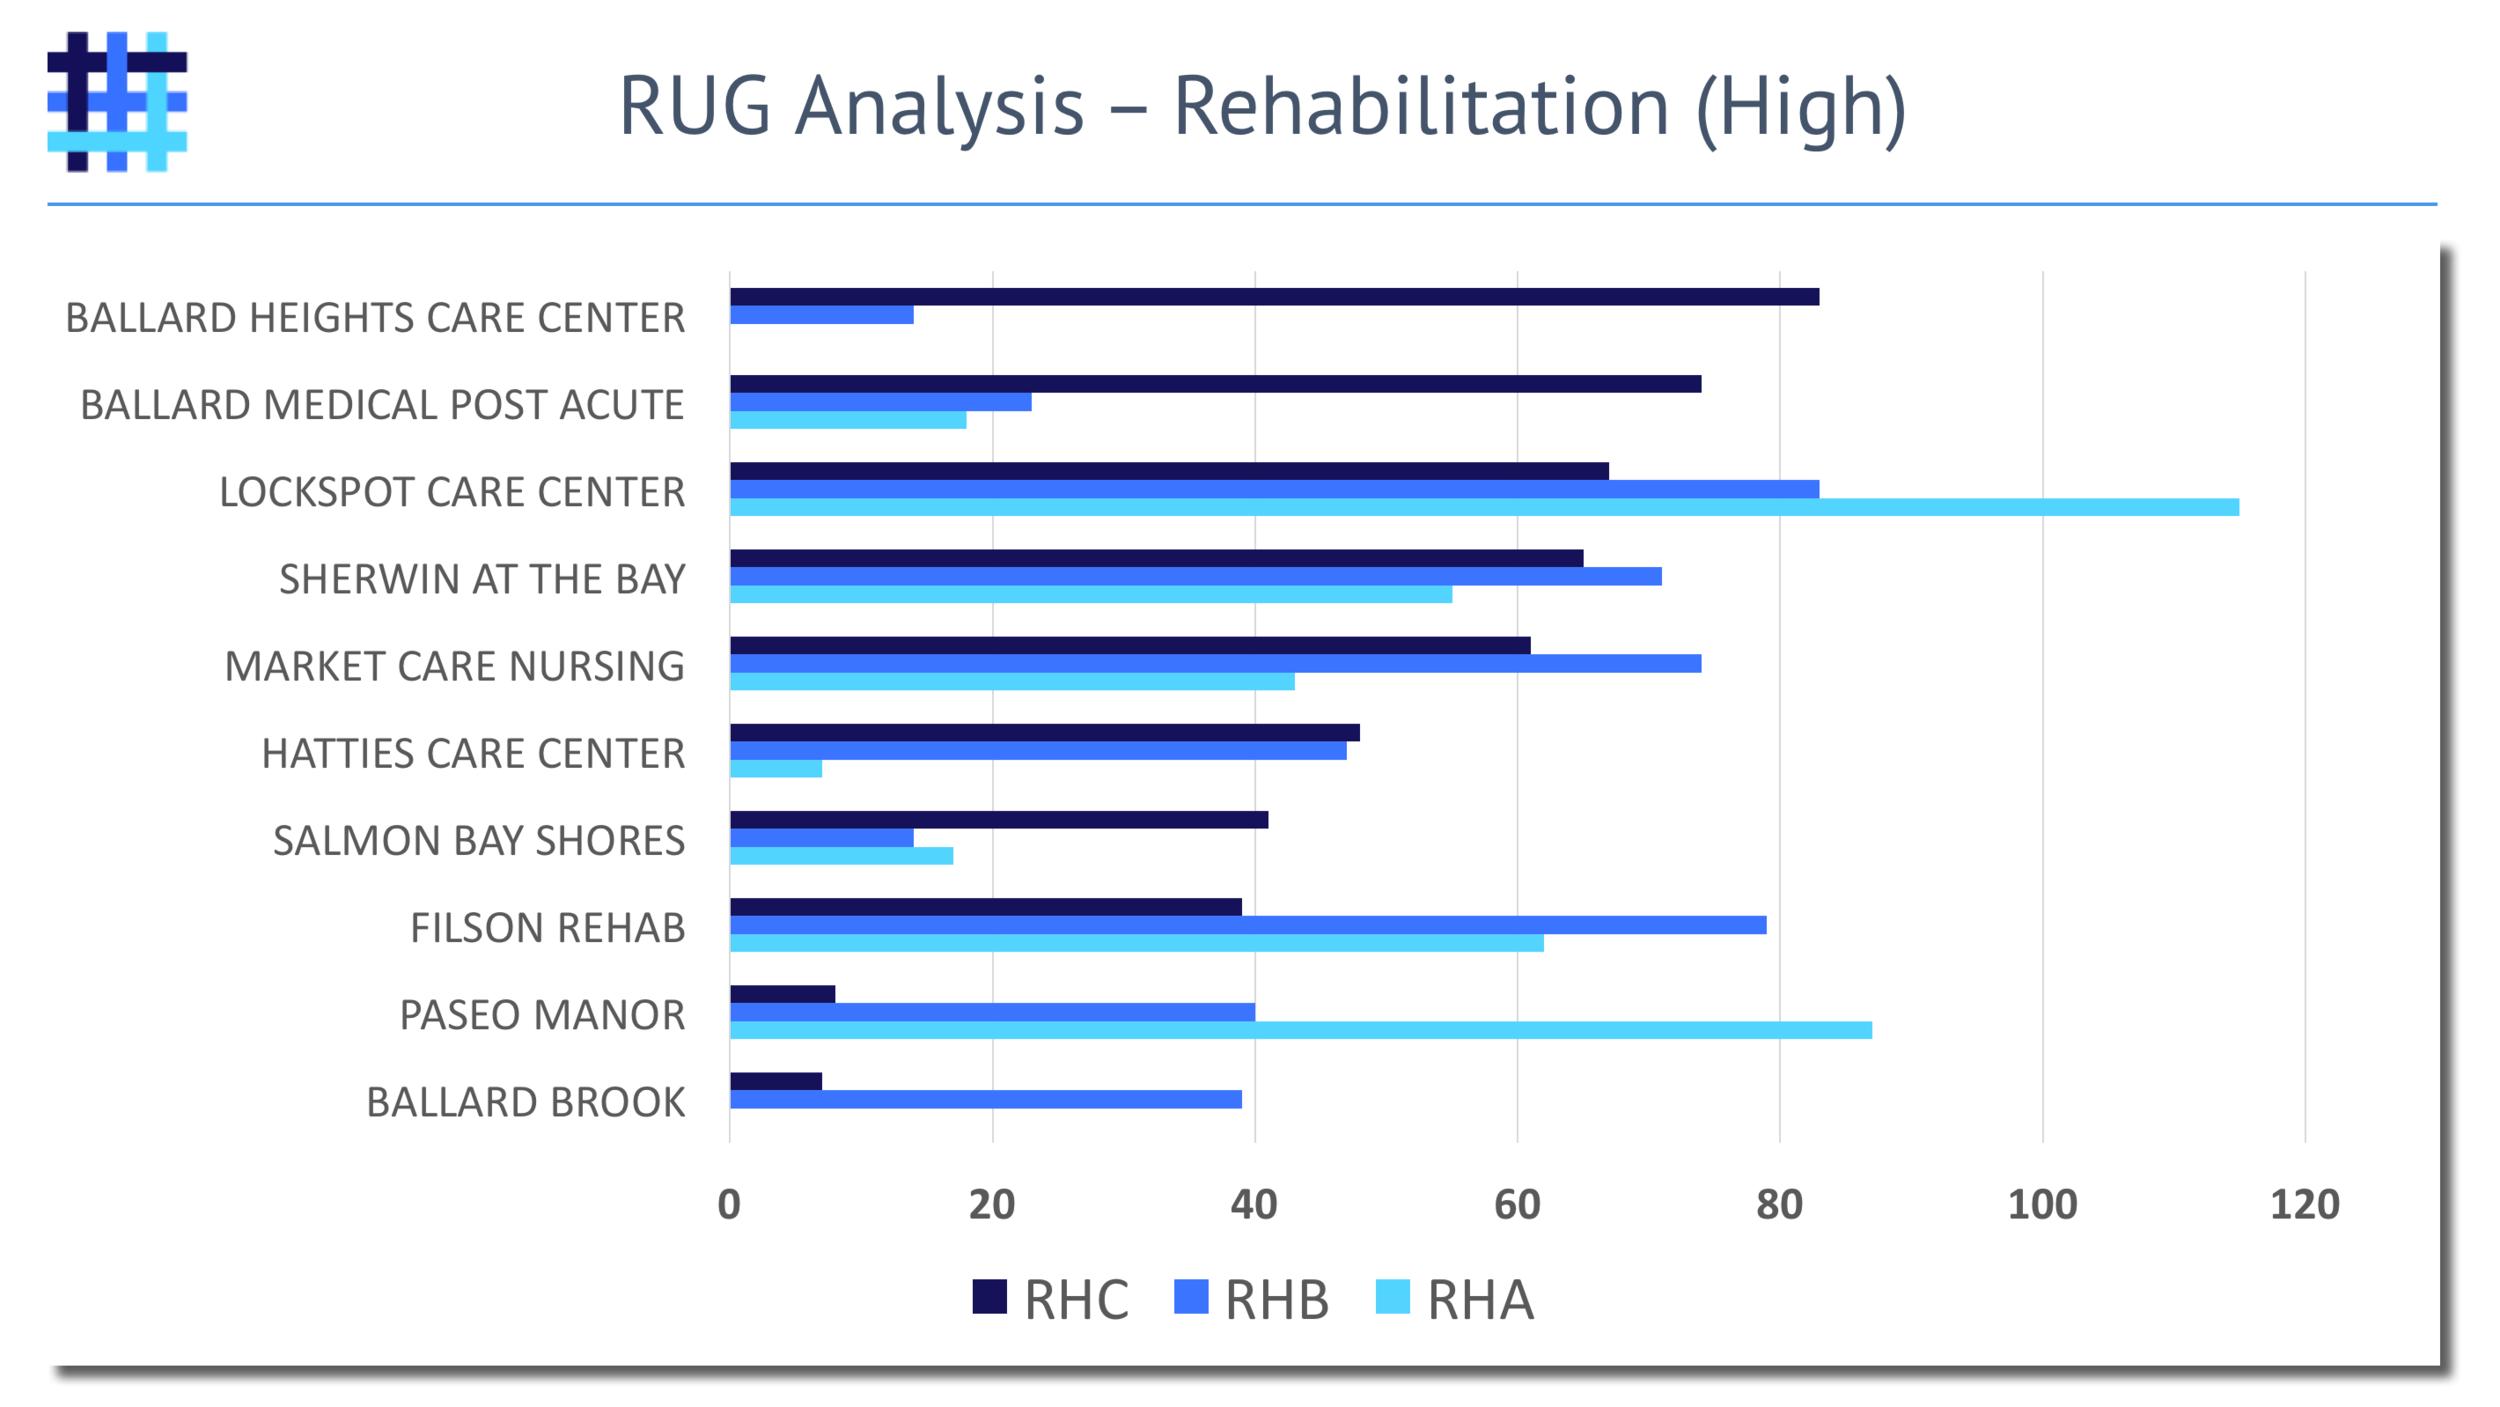 Nursing Home Resource Utilization Group (RUG) Analysis - Rehabilitation - High